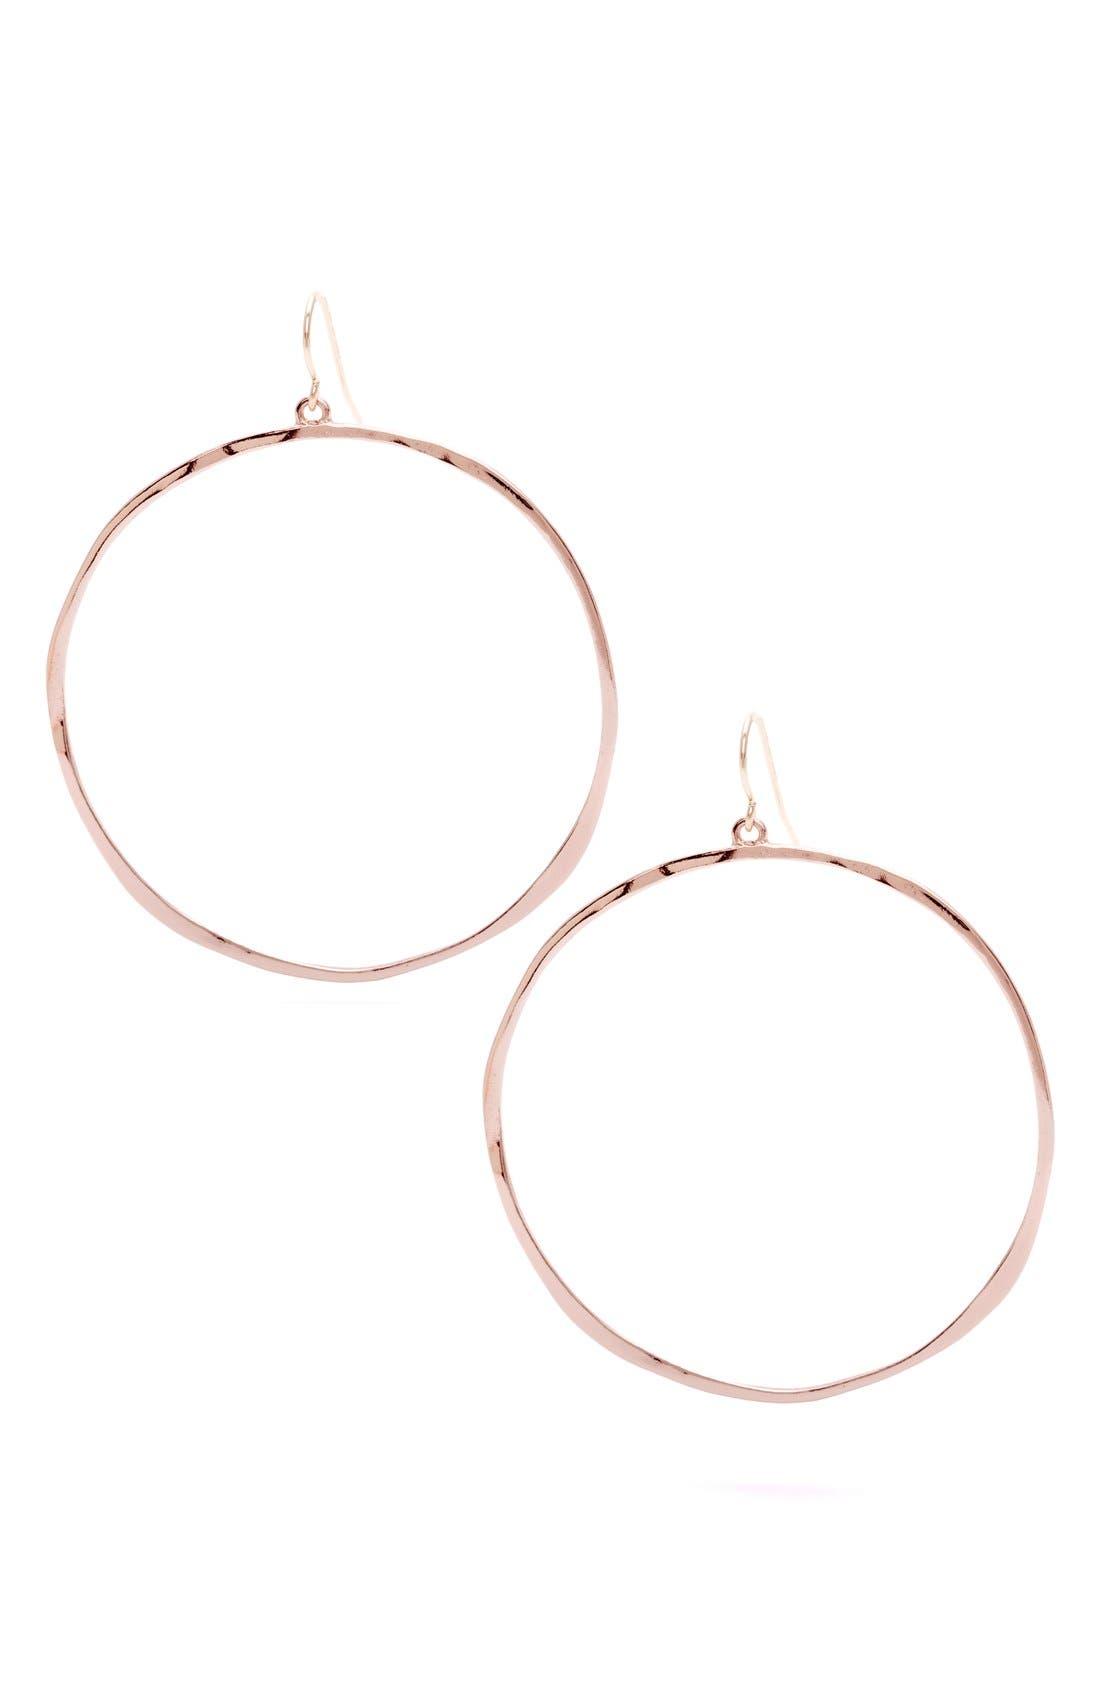 Alternate Image 1 Selected - gorjana G-Ring Frontal Hoop Earrings